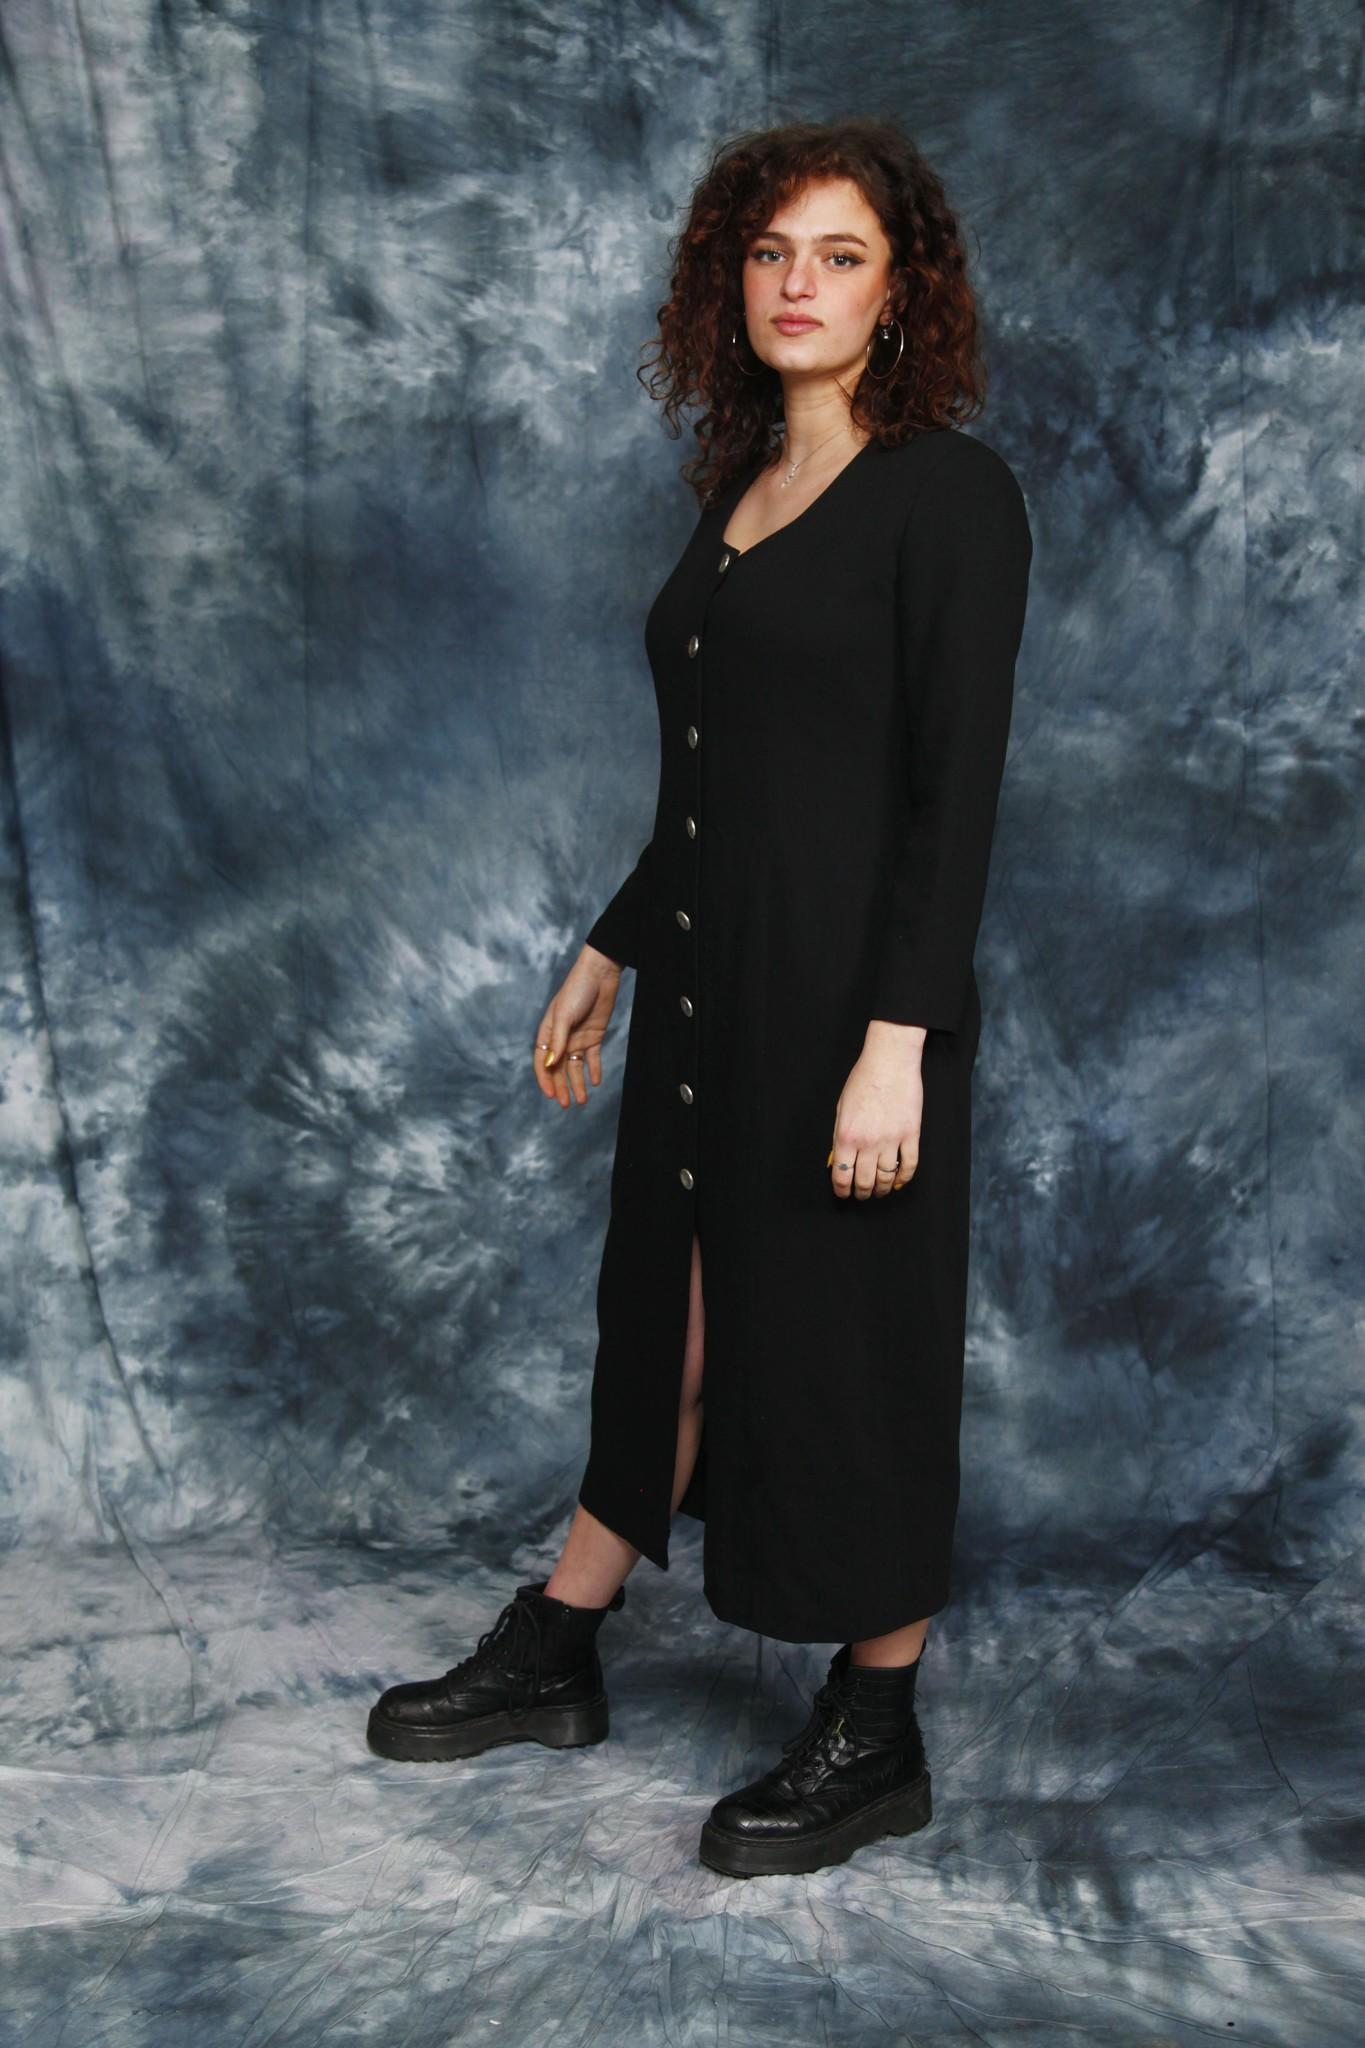 Black 80s winter dress